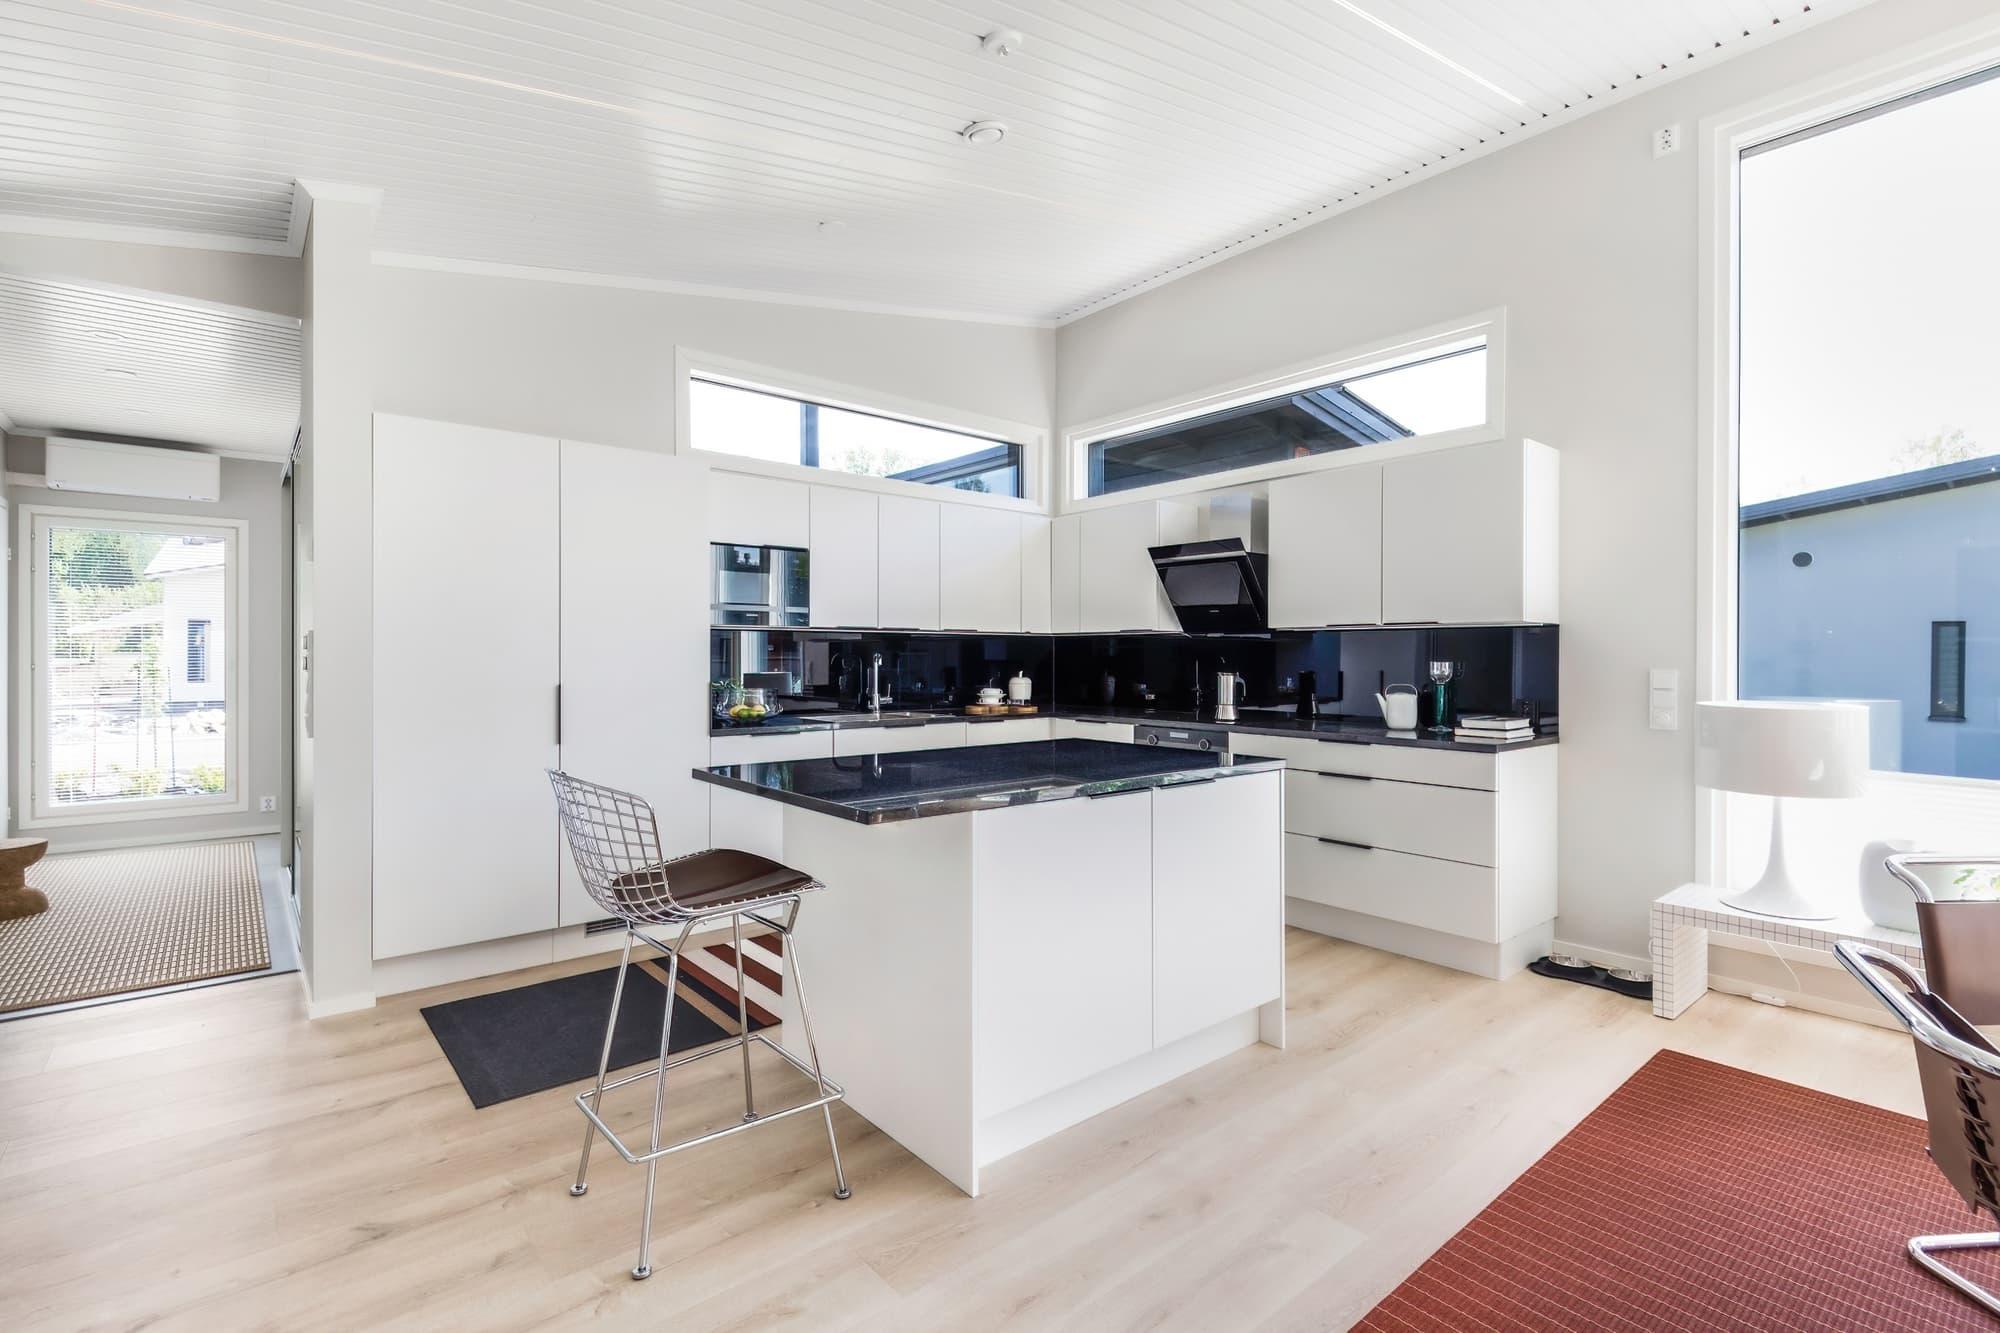 kannustalon-suomi-messutalo-2021-olohuone-keittio-ruokailutila-5